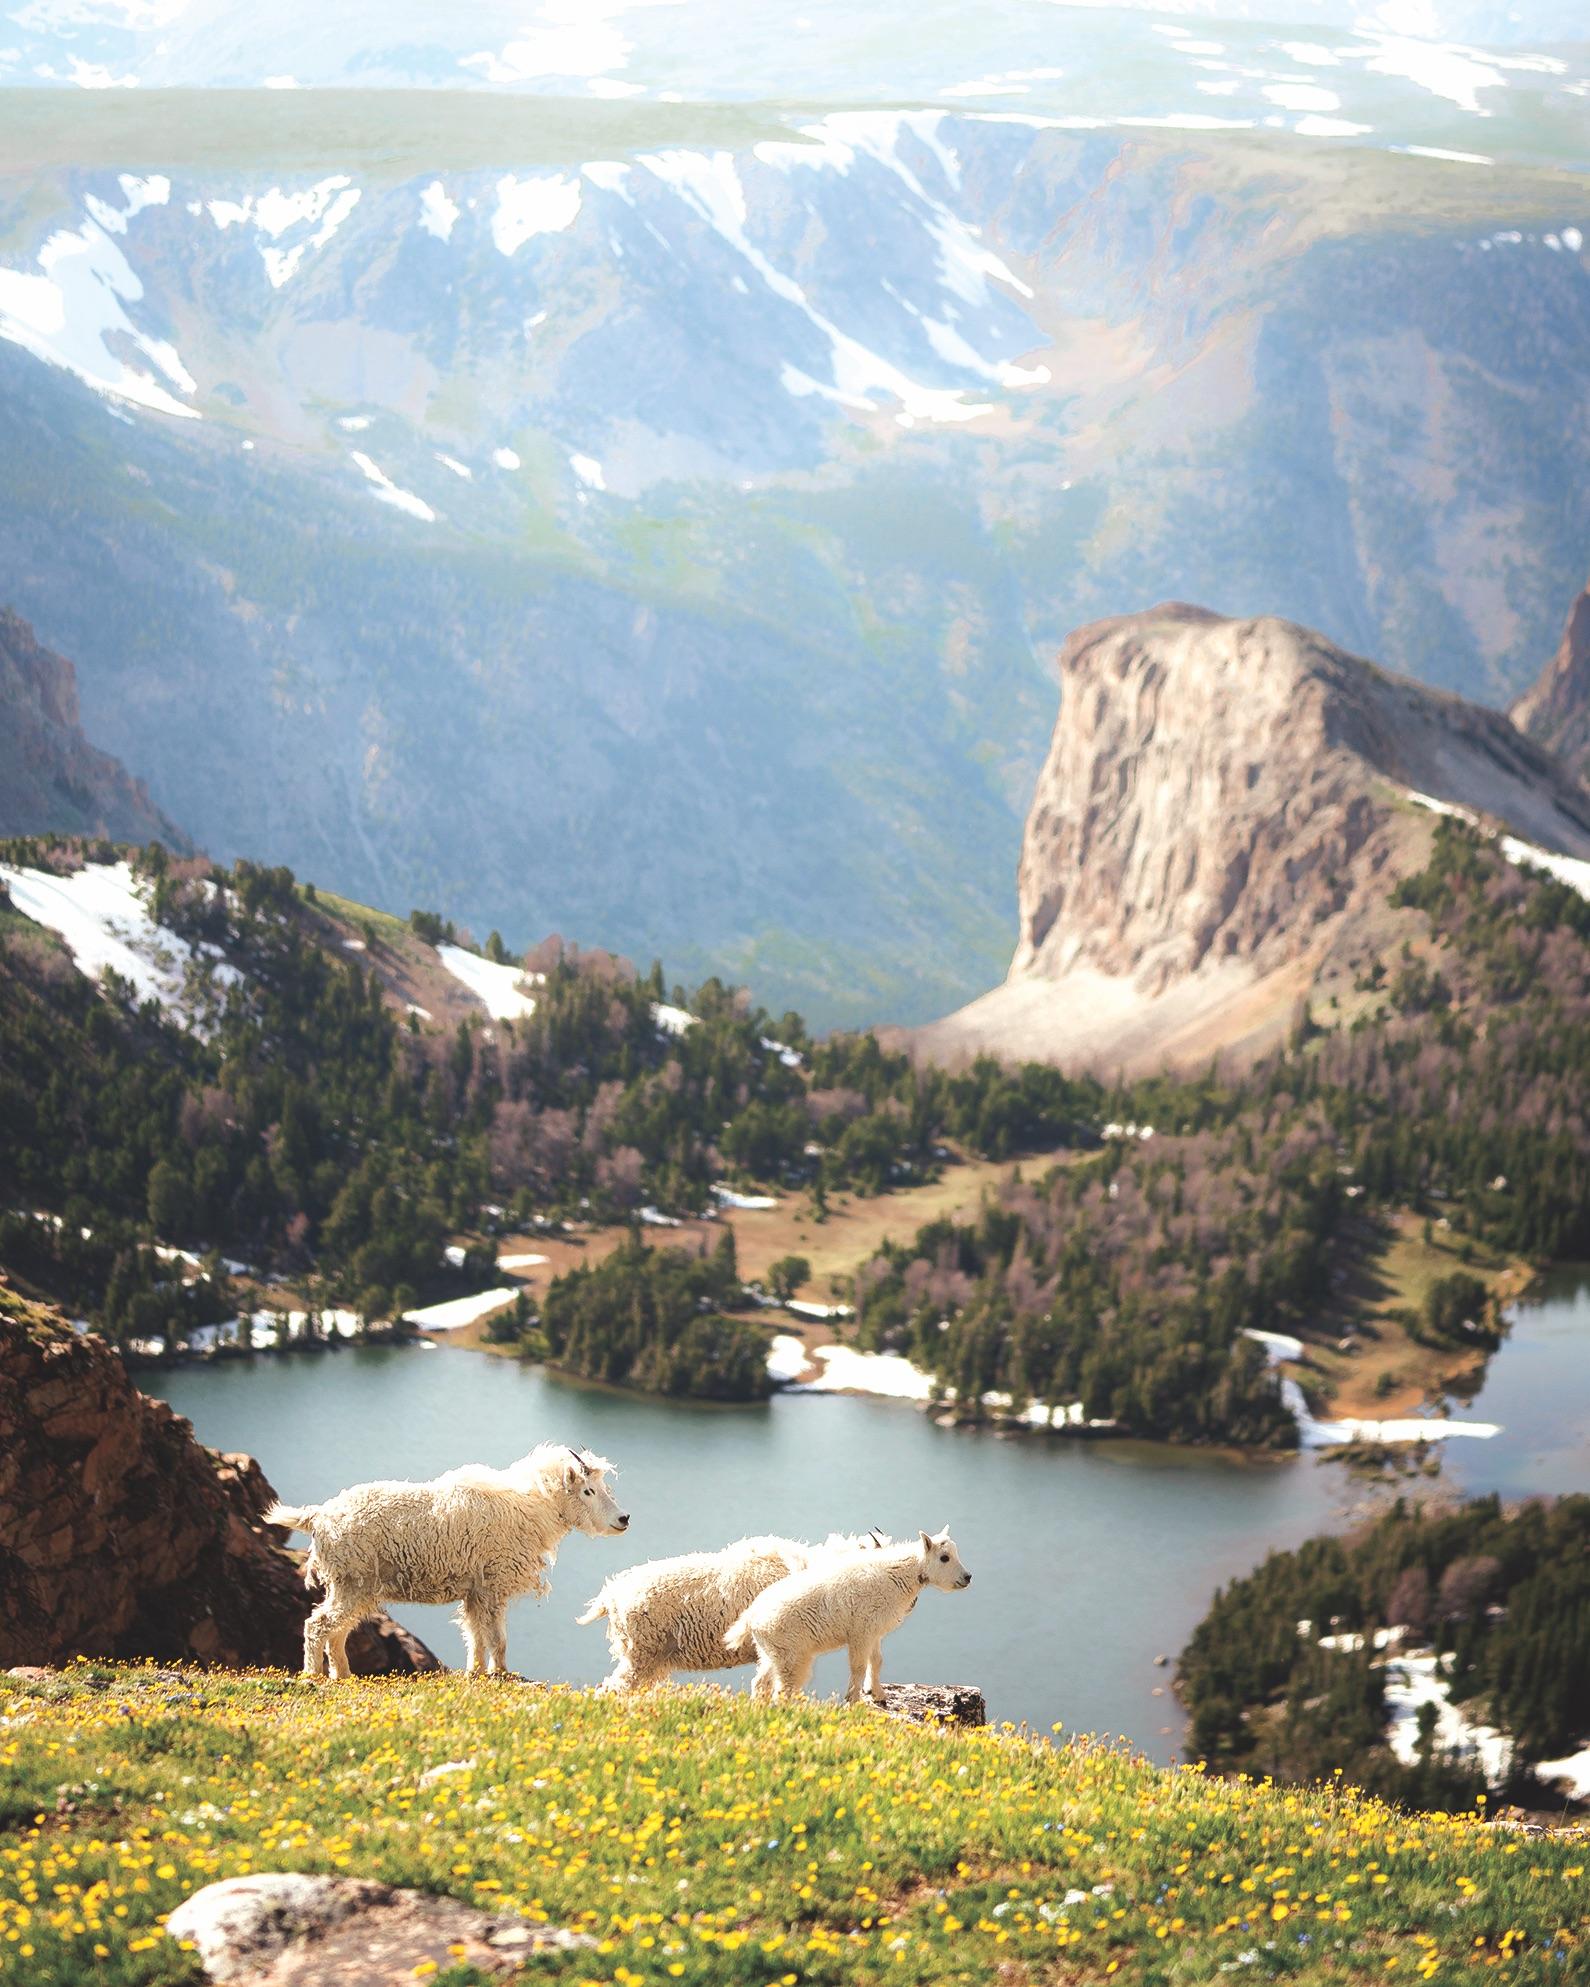 Destination Mtn Goats